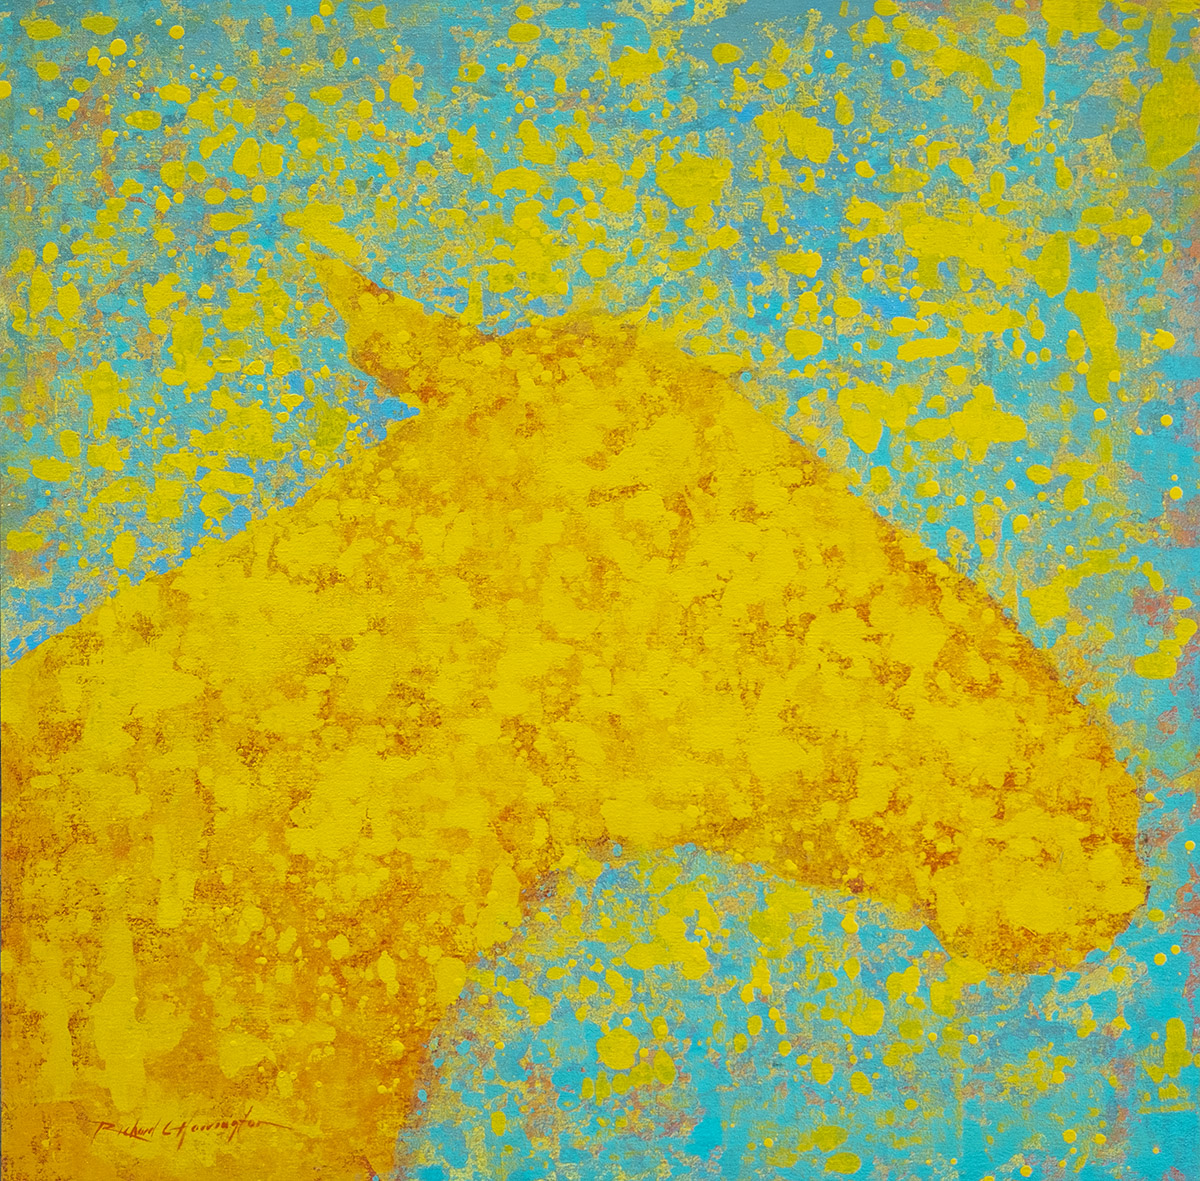 Yellow Dapple, 34 x 34, acrylic on panel. Available through artist.